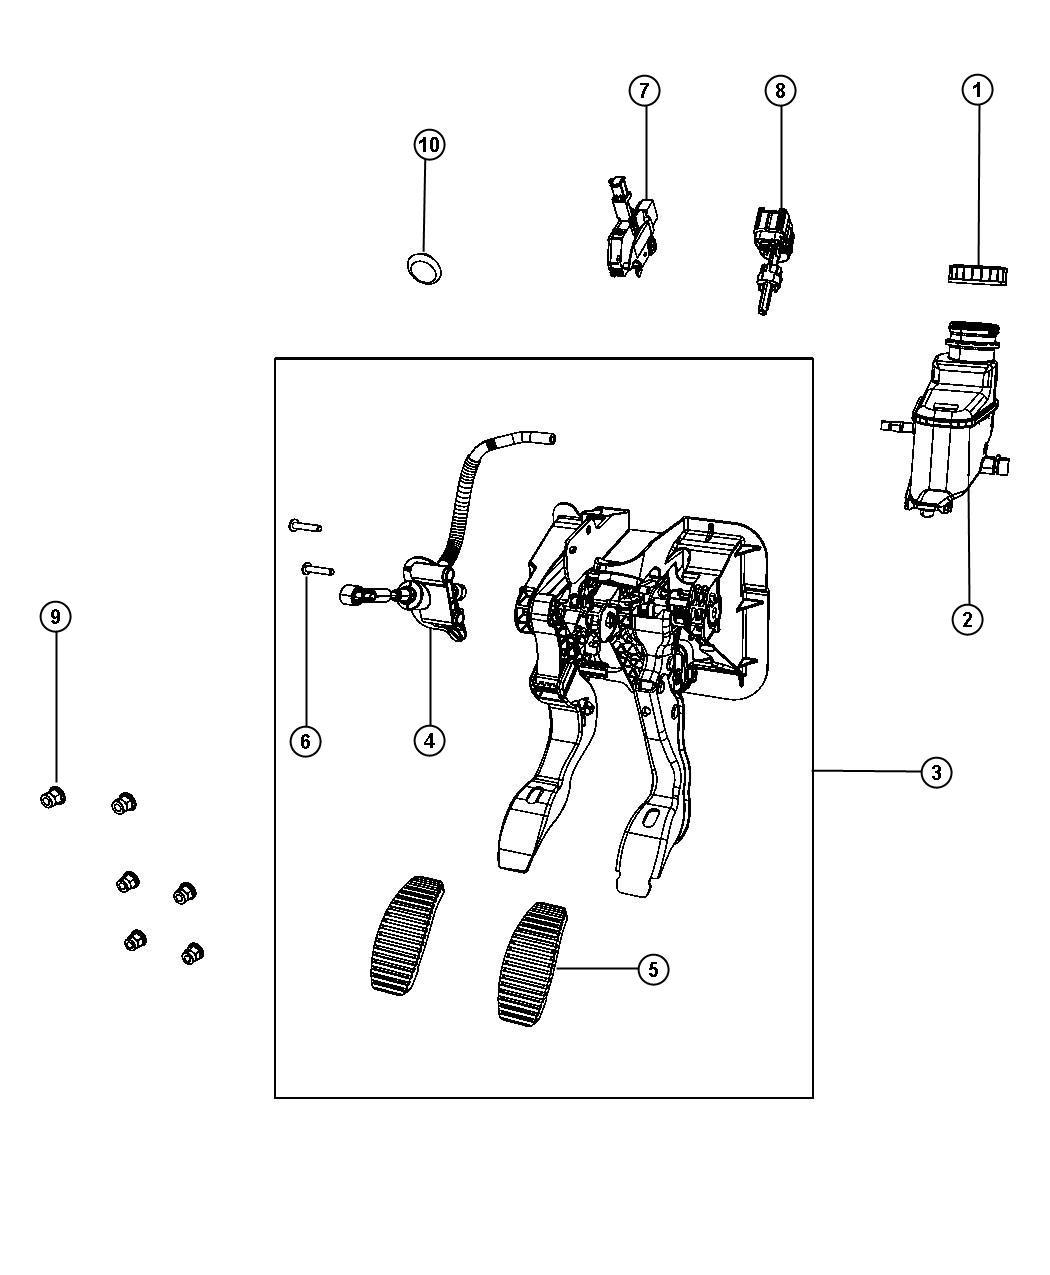 2017 jeep renegade switch  stop lamp  export  pedalclutchfwdrwdawd  pedalbrake